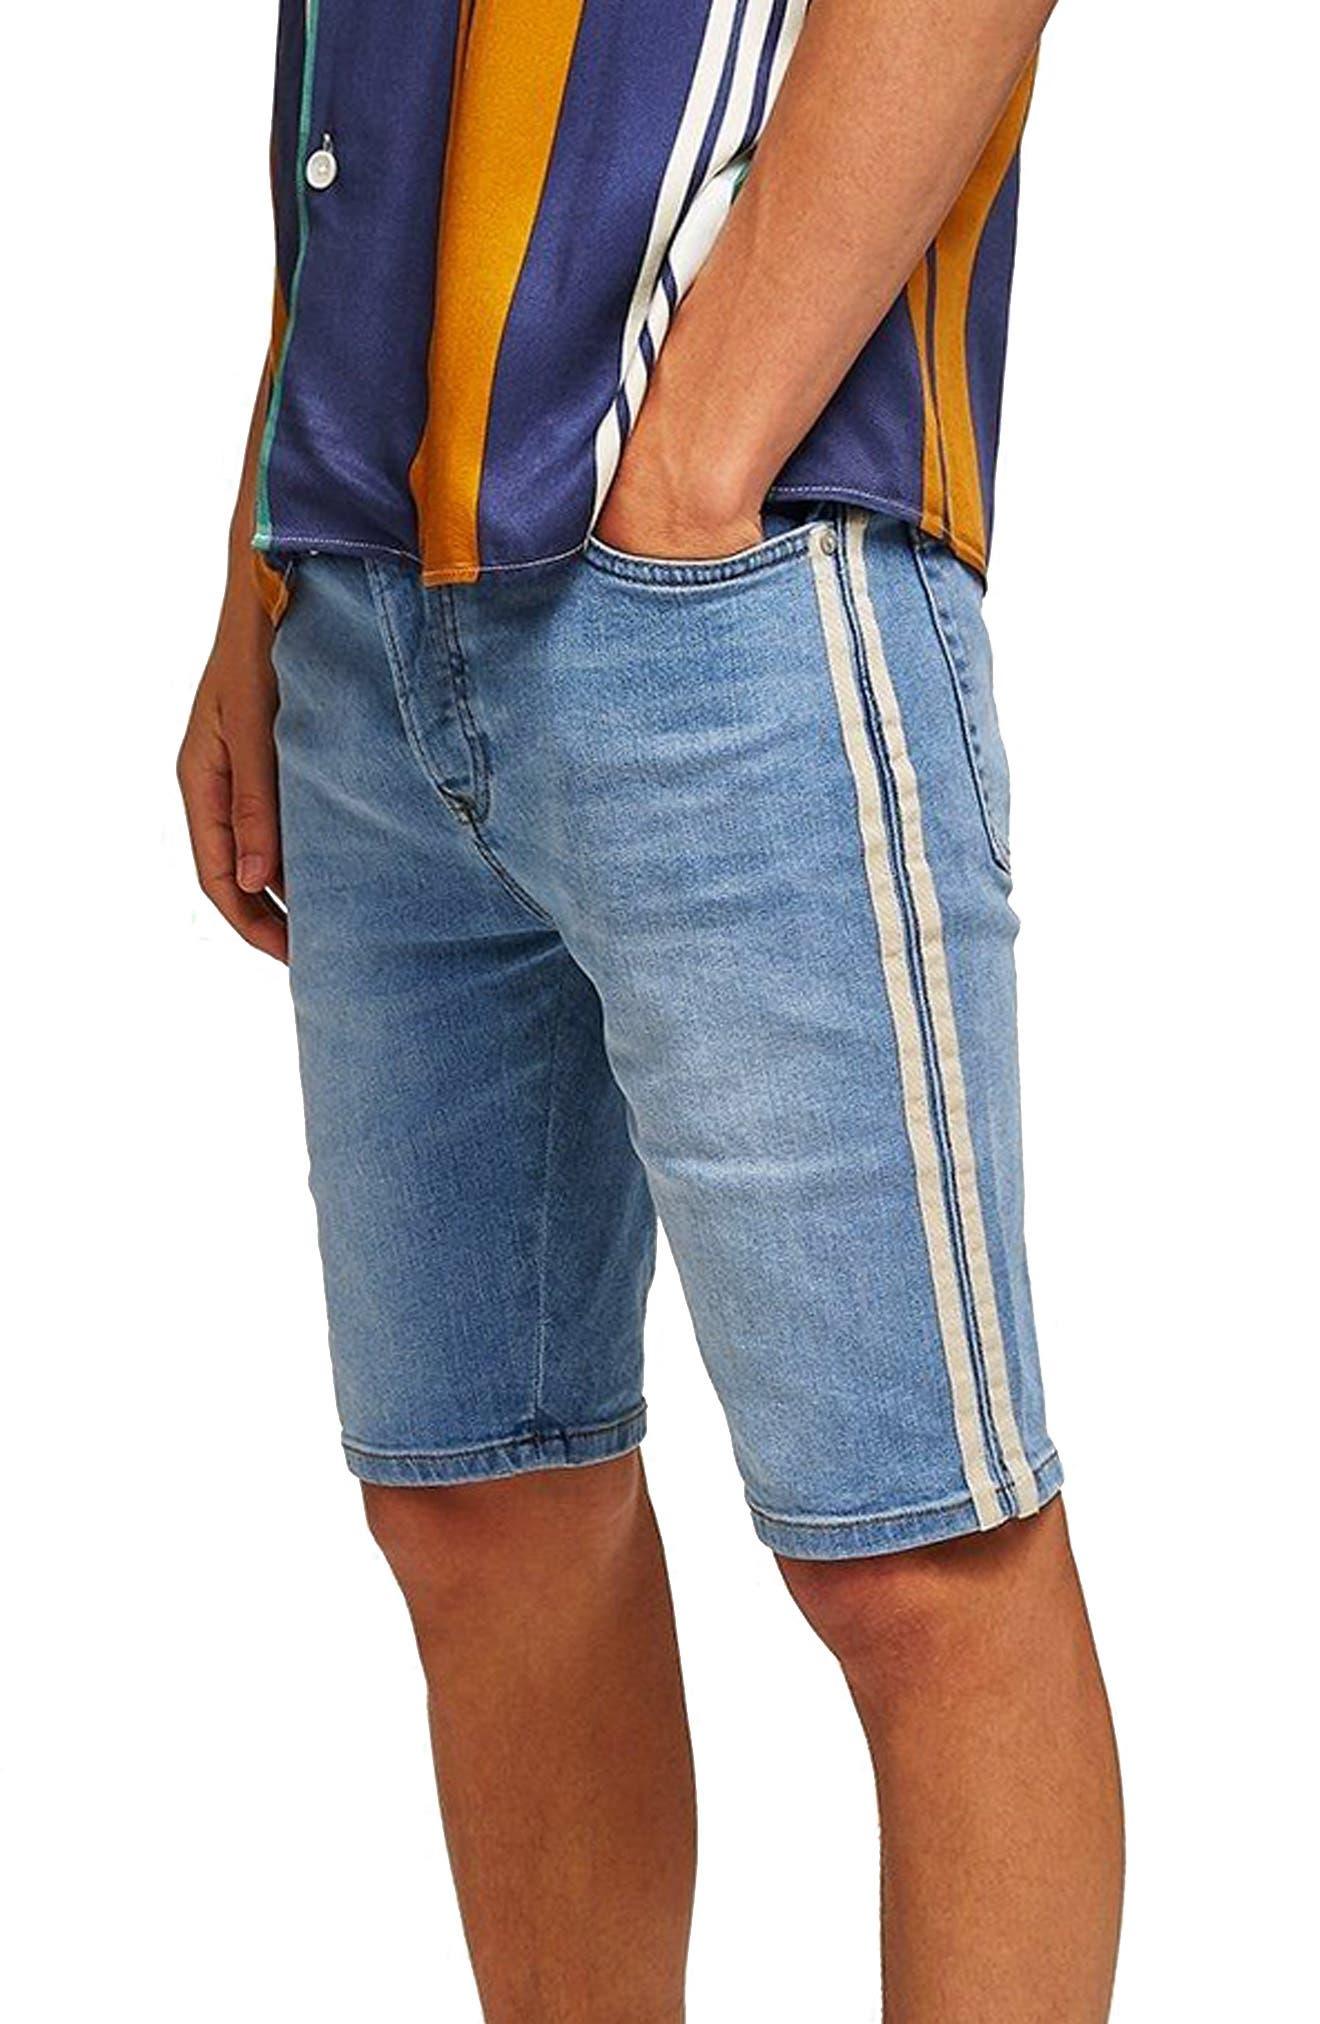 Tape Stretch Skinny Fit Denim Shorts,                             Main thumbnail 1, color,                             Blue